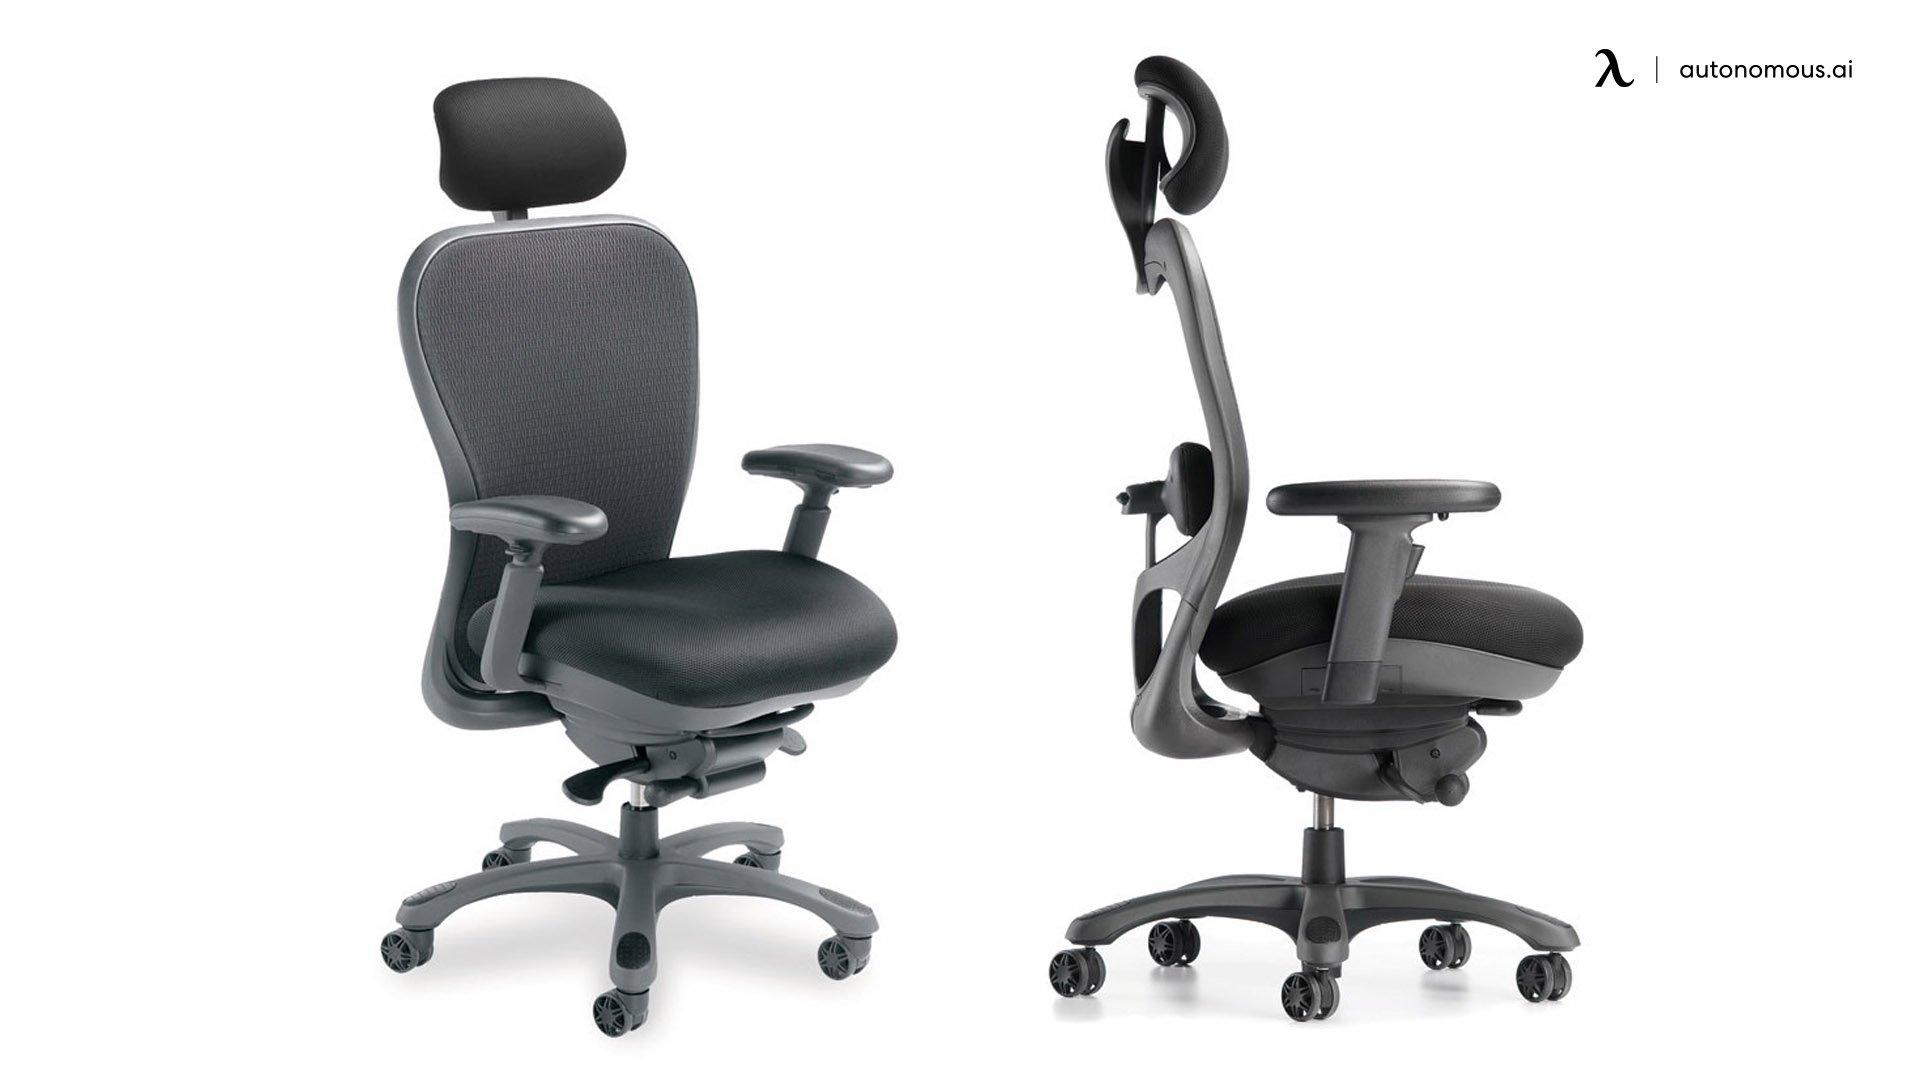 Nightingale CXO 6200D Chair